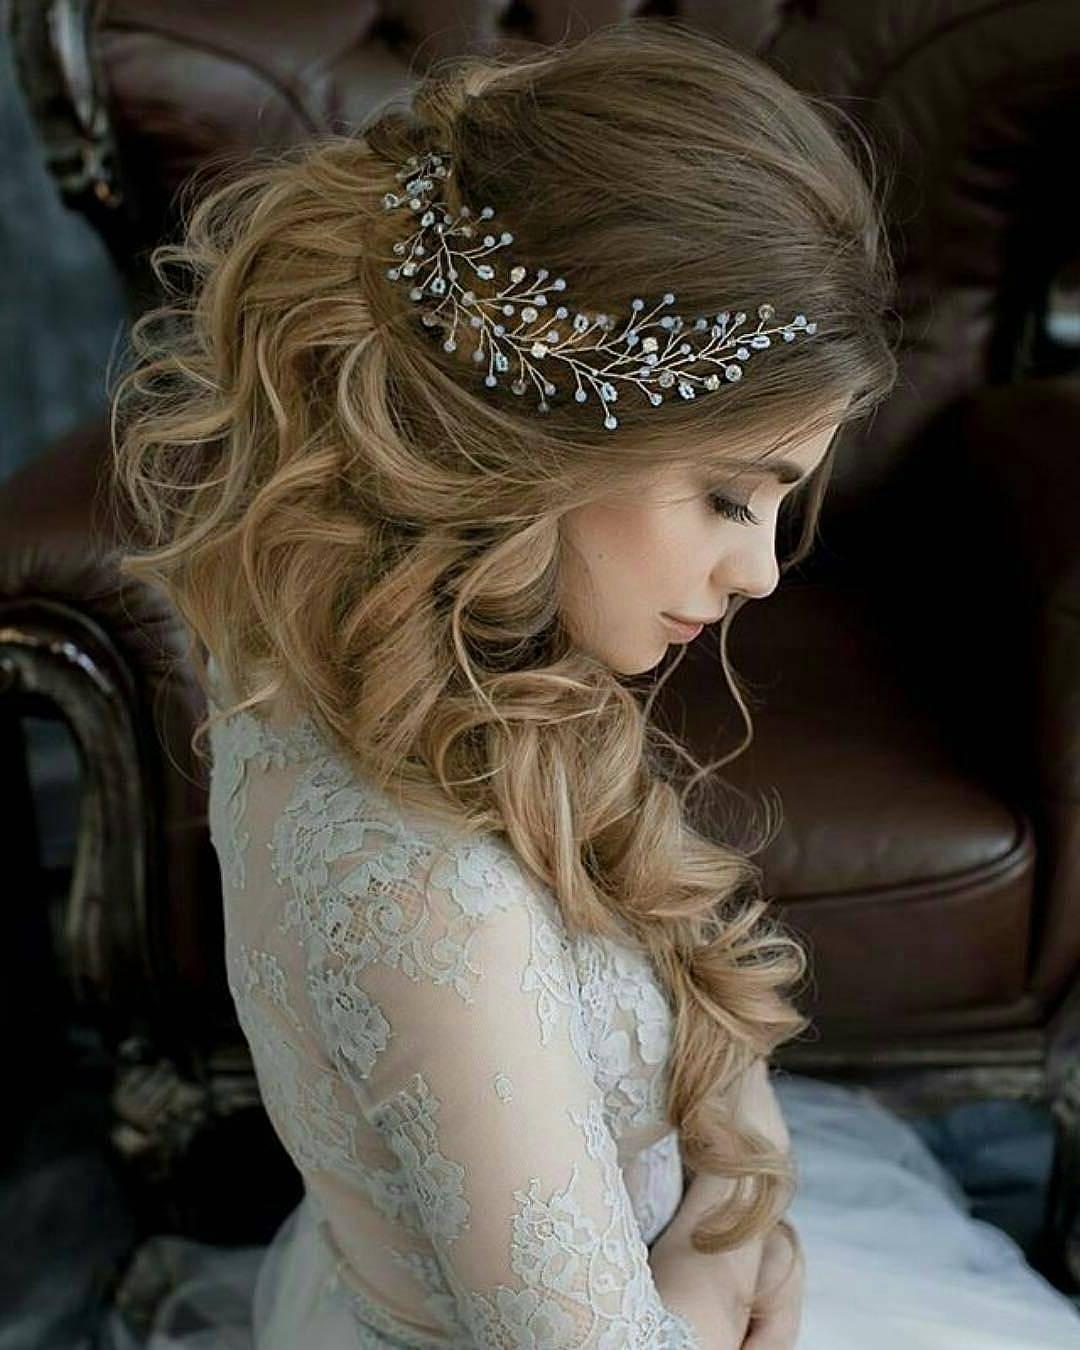 Favorite Short Classic Wedding Hairstyles With Modern Twist Regarding 10 Lavish Wedding Hairstyles For Long Hair – Wedding Hairstyle Ideas (View 17 of 20)